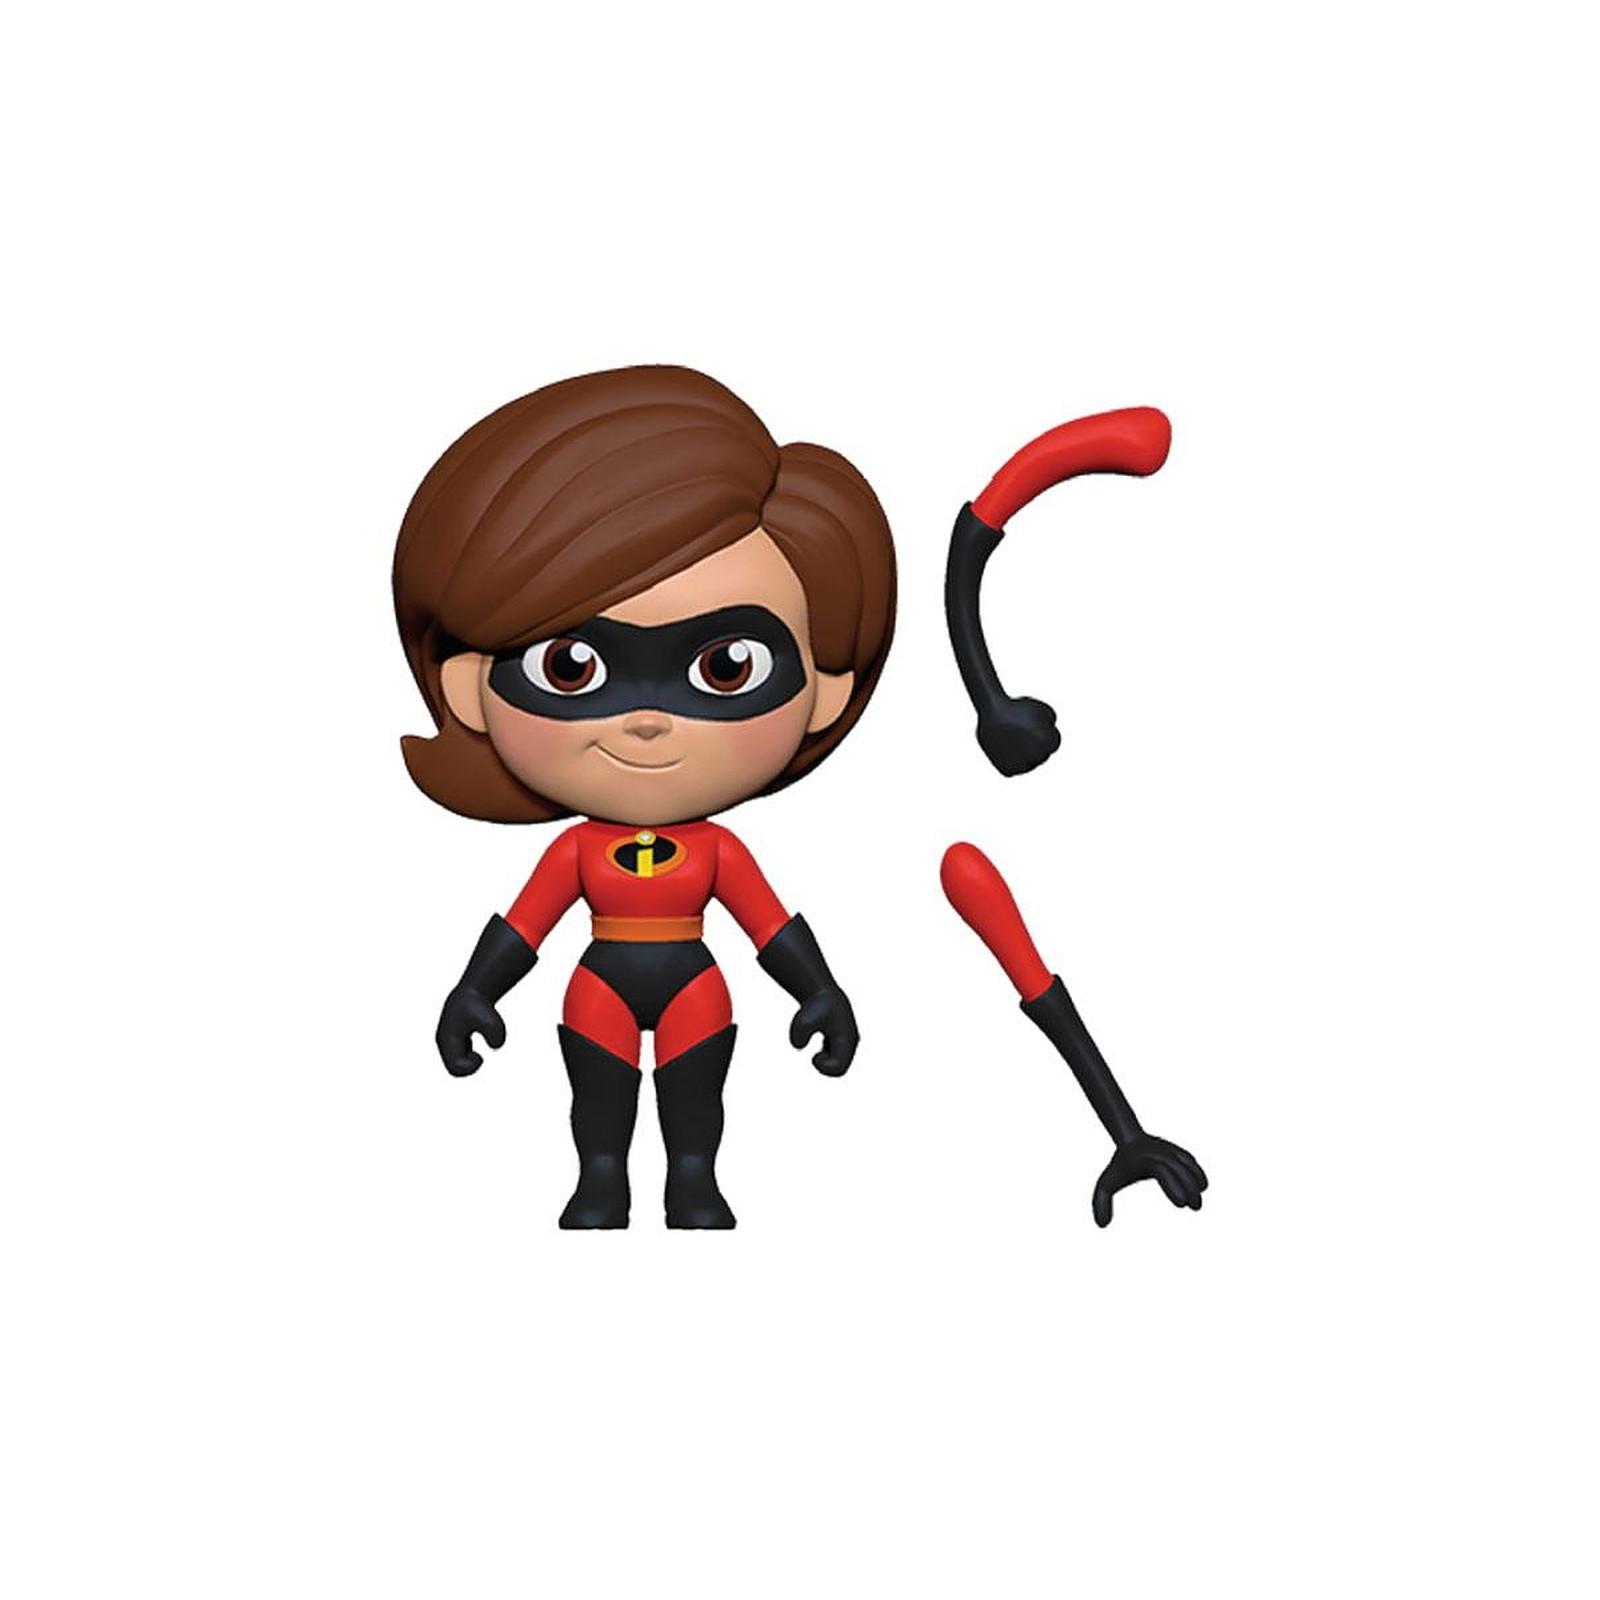 Elastigirl Super-héros Personnage 10 cm Disney Les incroyables 2